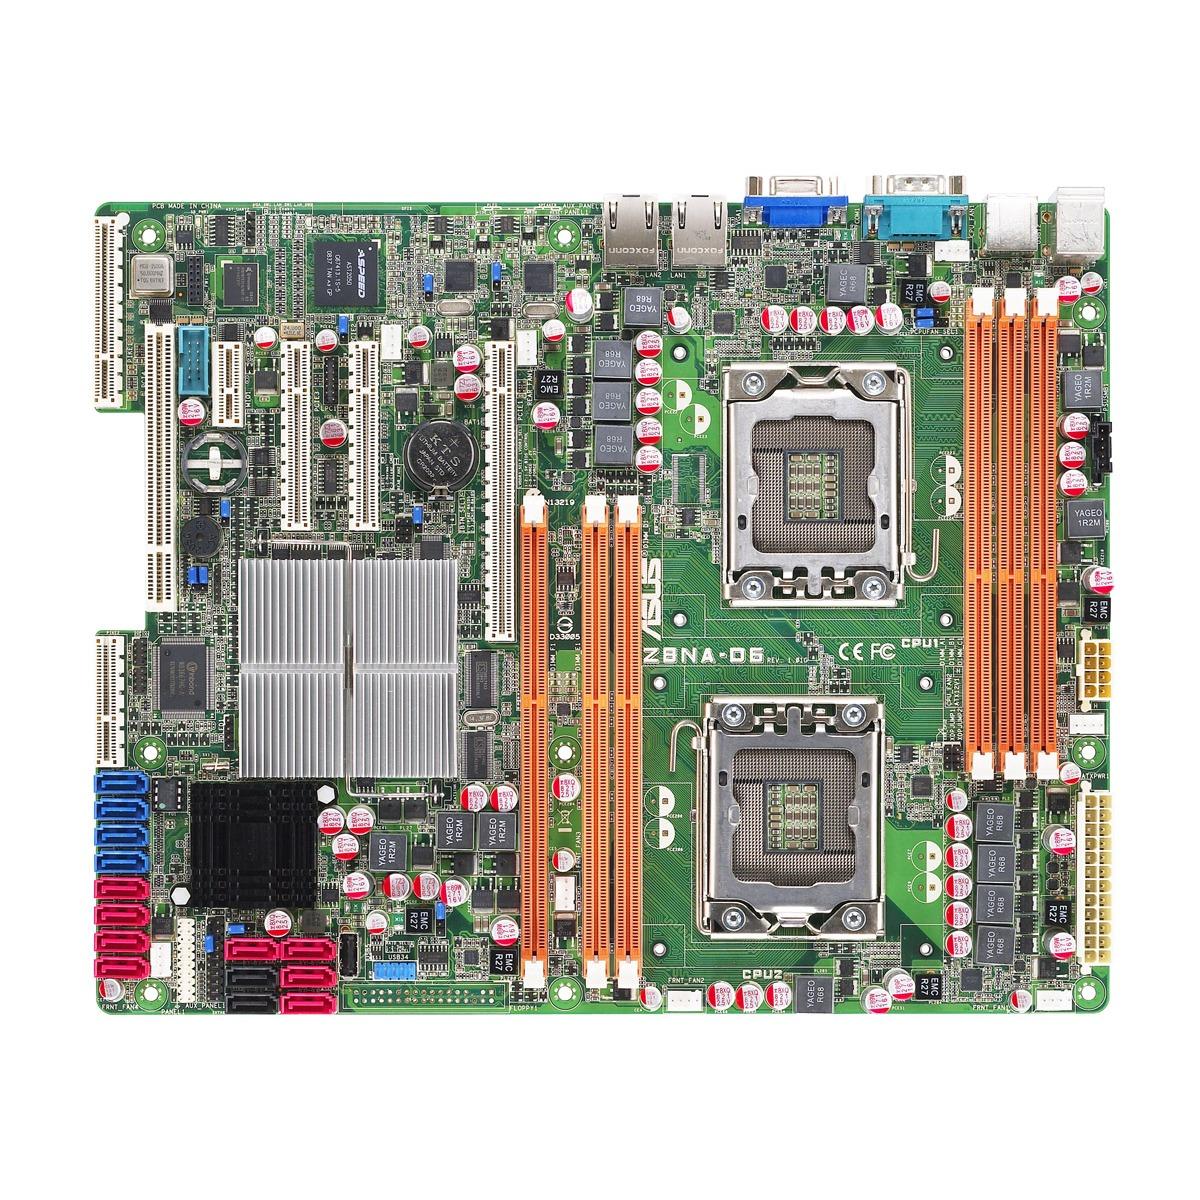 Carte mère ASUS Z8NA-D6 Carte mère ATX Socket 1366 Intel 5500